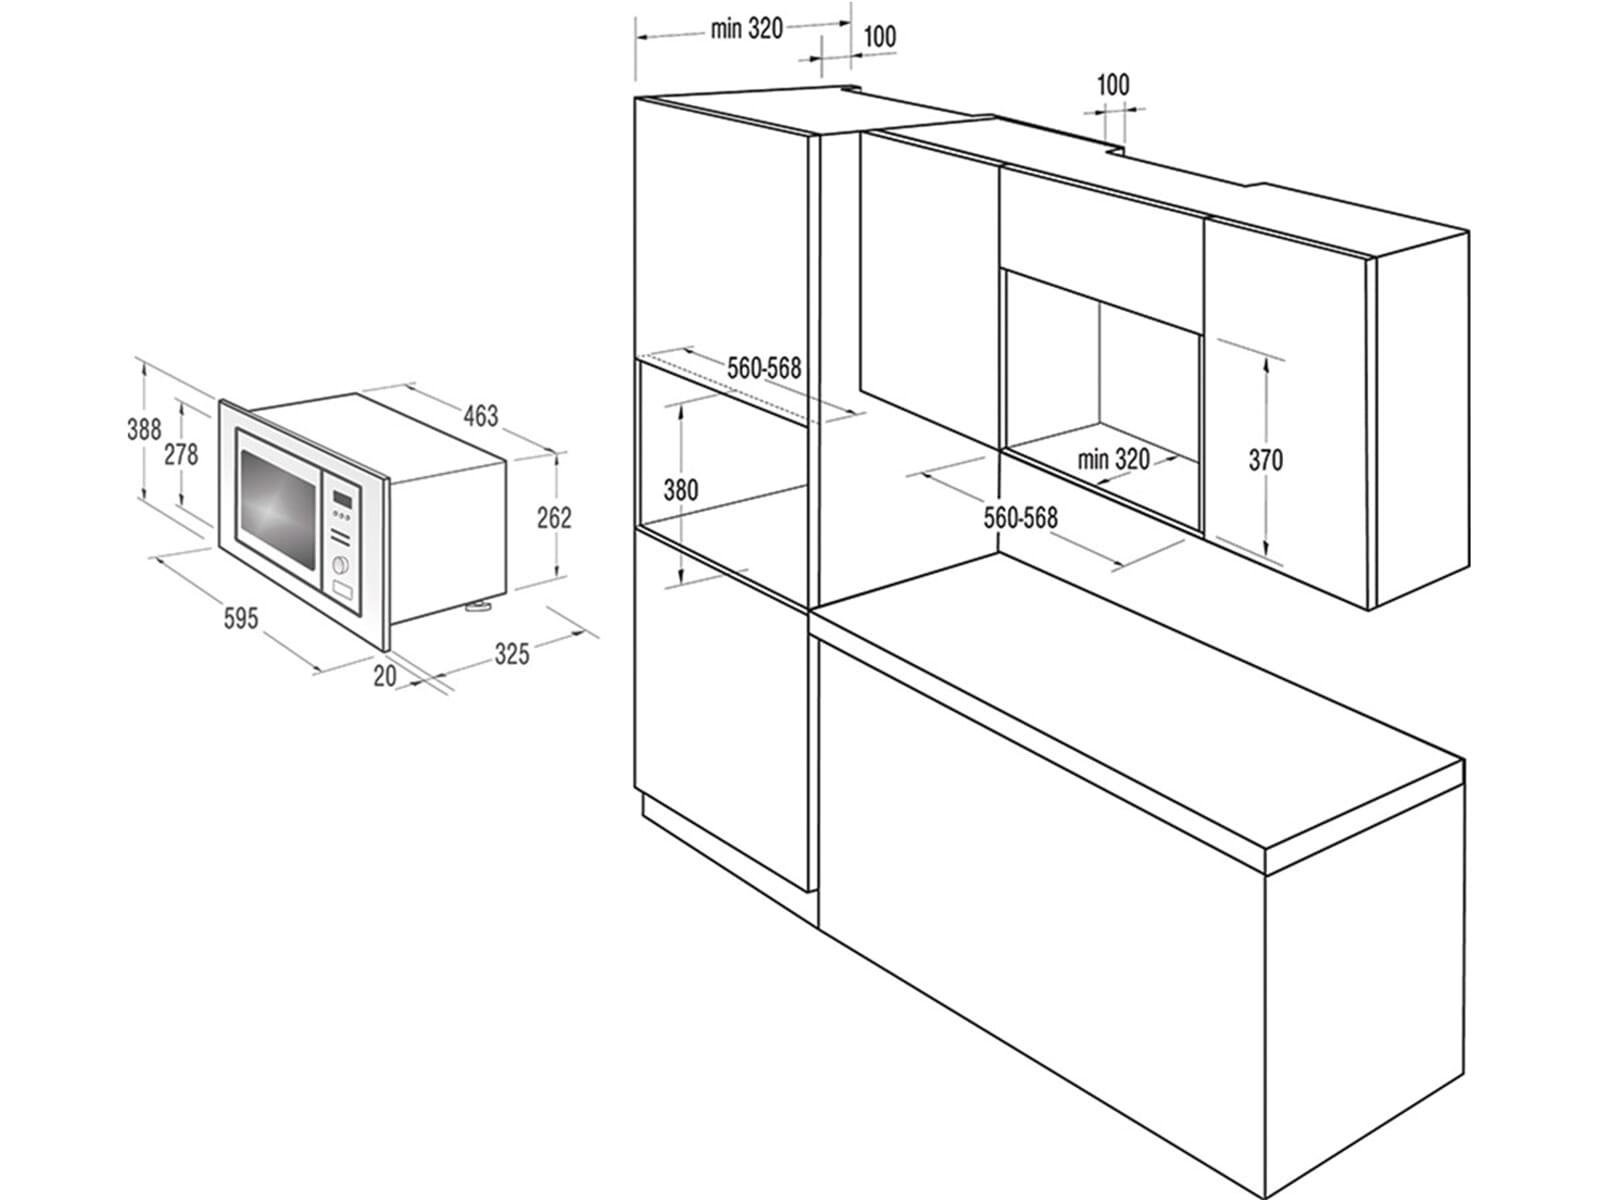 gorenje bm 171 d3x einbau mikrowelle edelstahl. Black Bedroom Furniture Sets. Home Design Ideas